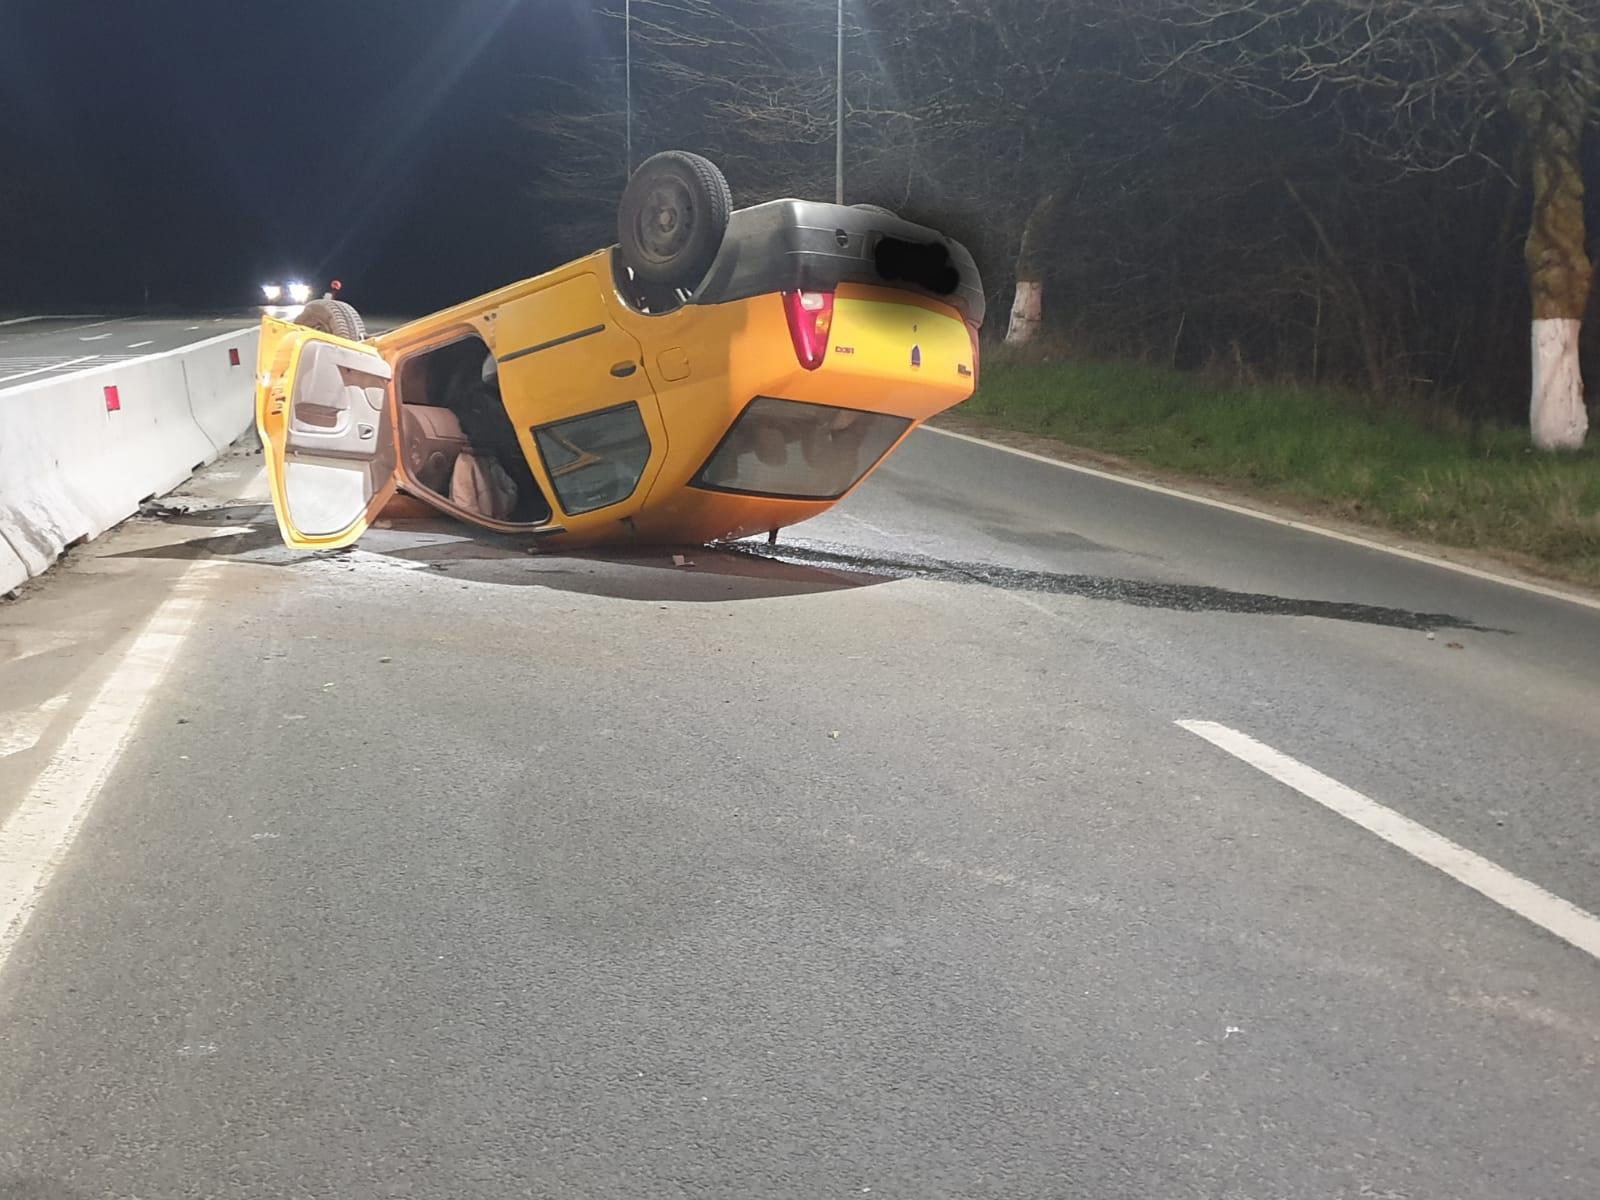 accident constanța 30 martie 2019